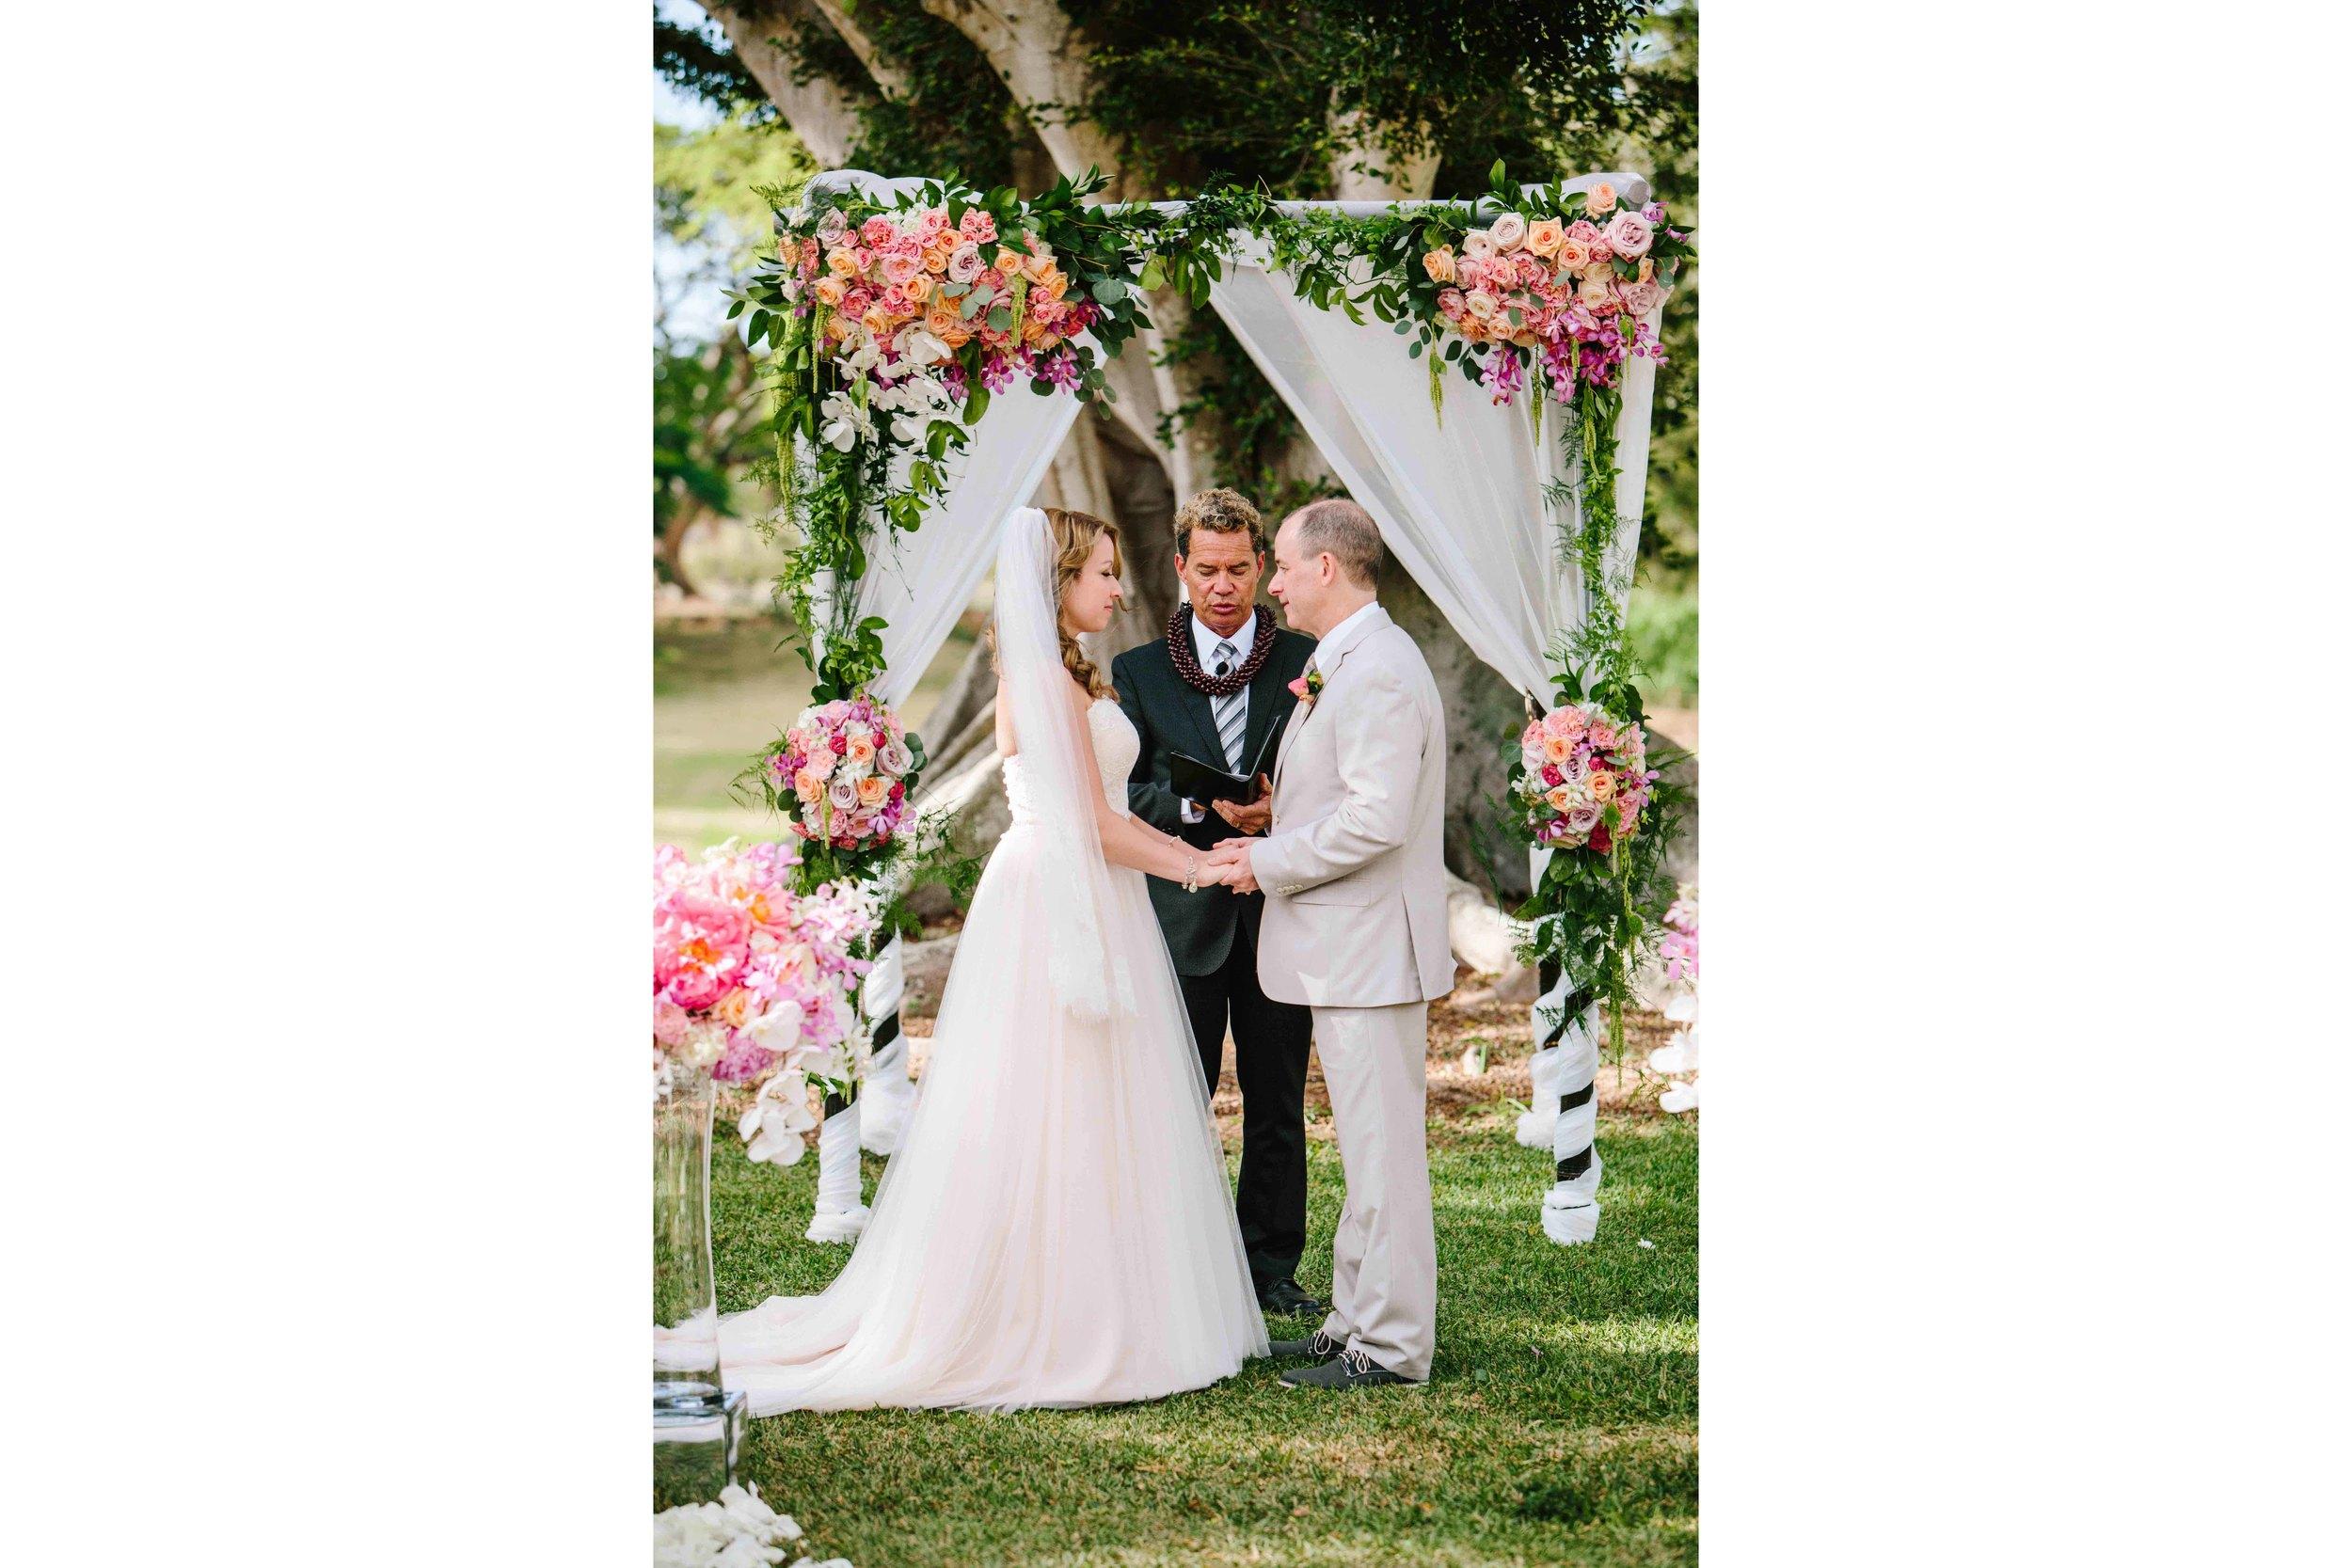 Hawaii Wedding Photography at Dillingham Ranch